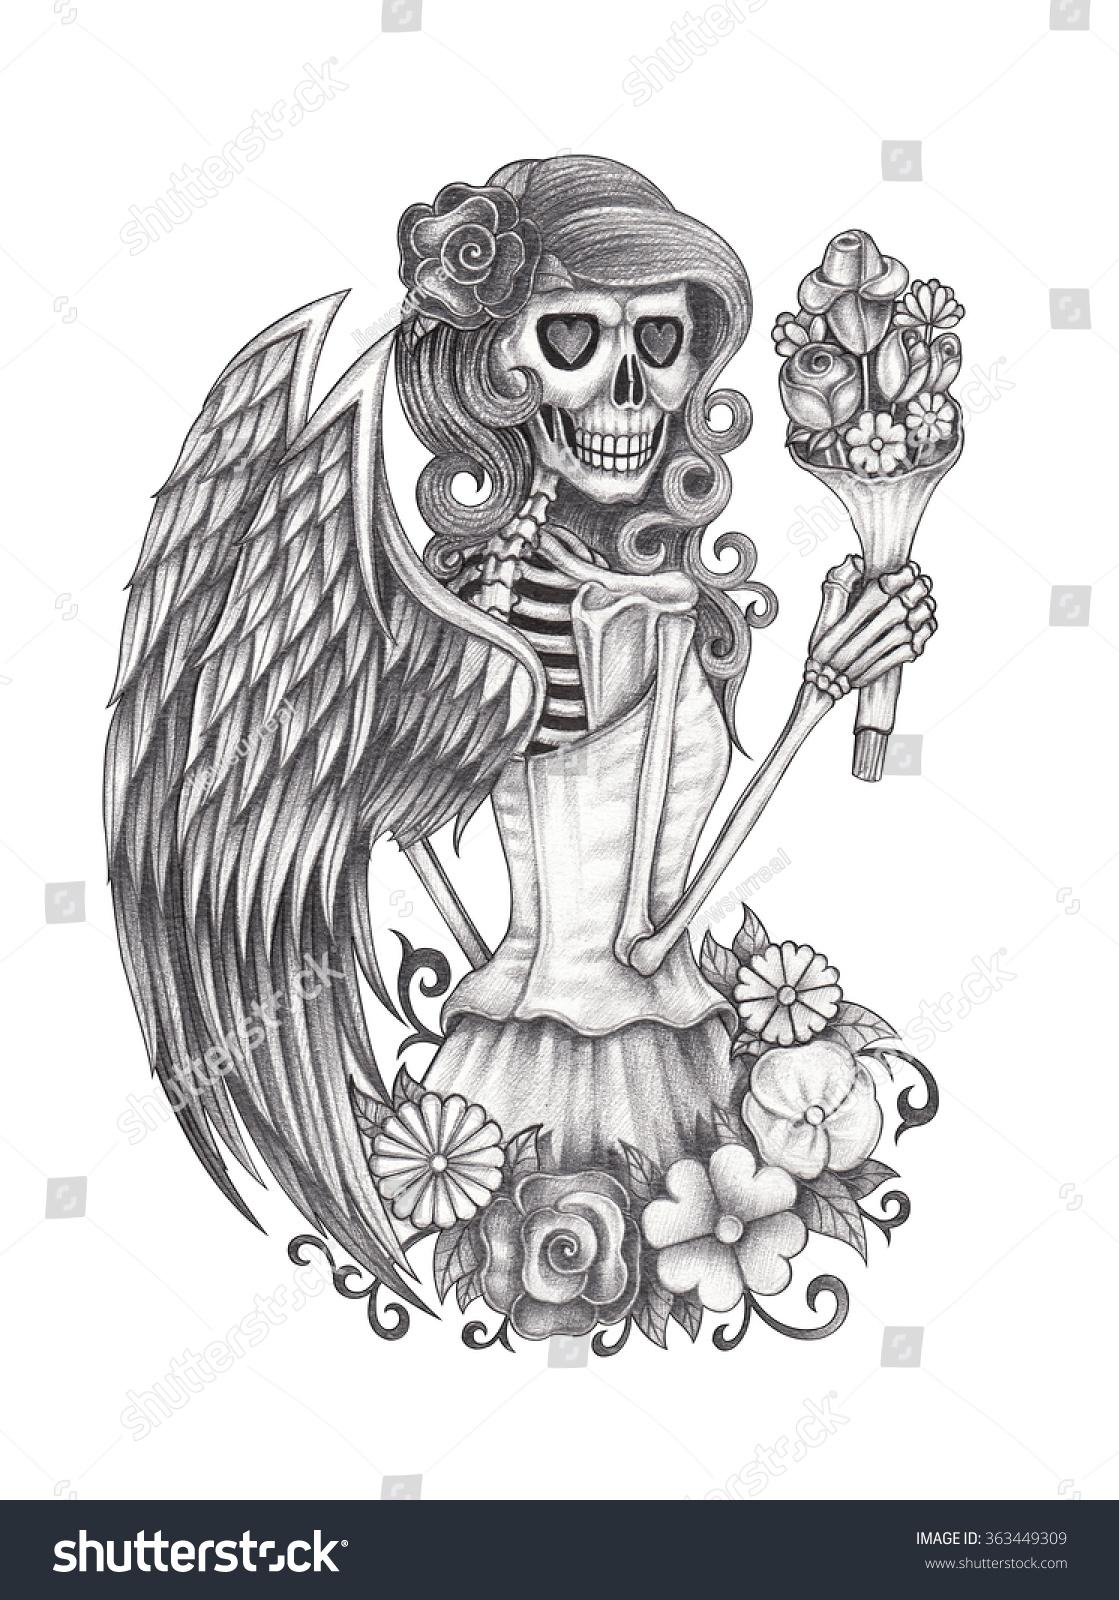 Skull angel hand pencil drawing on stock photo 363449309